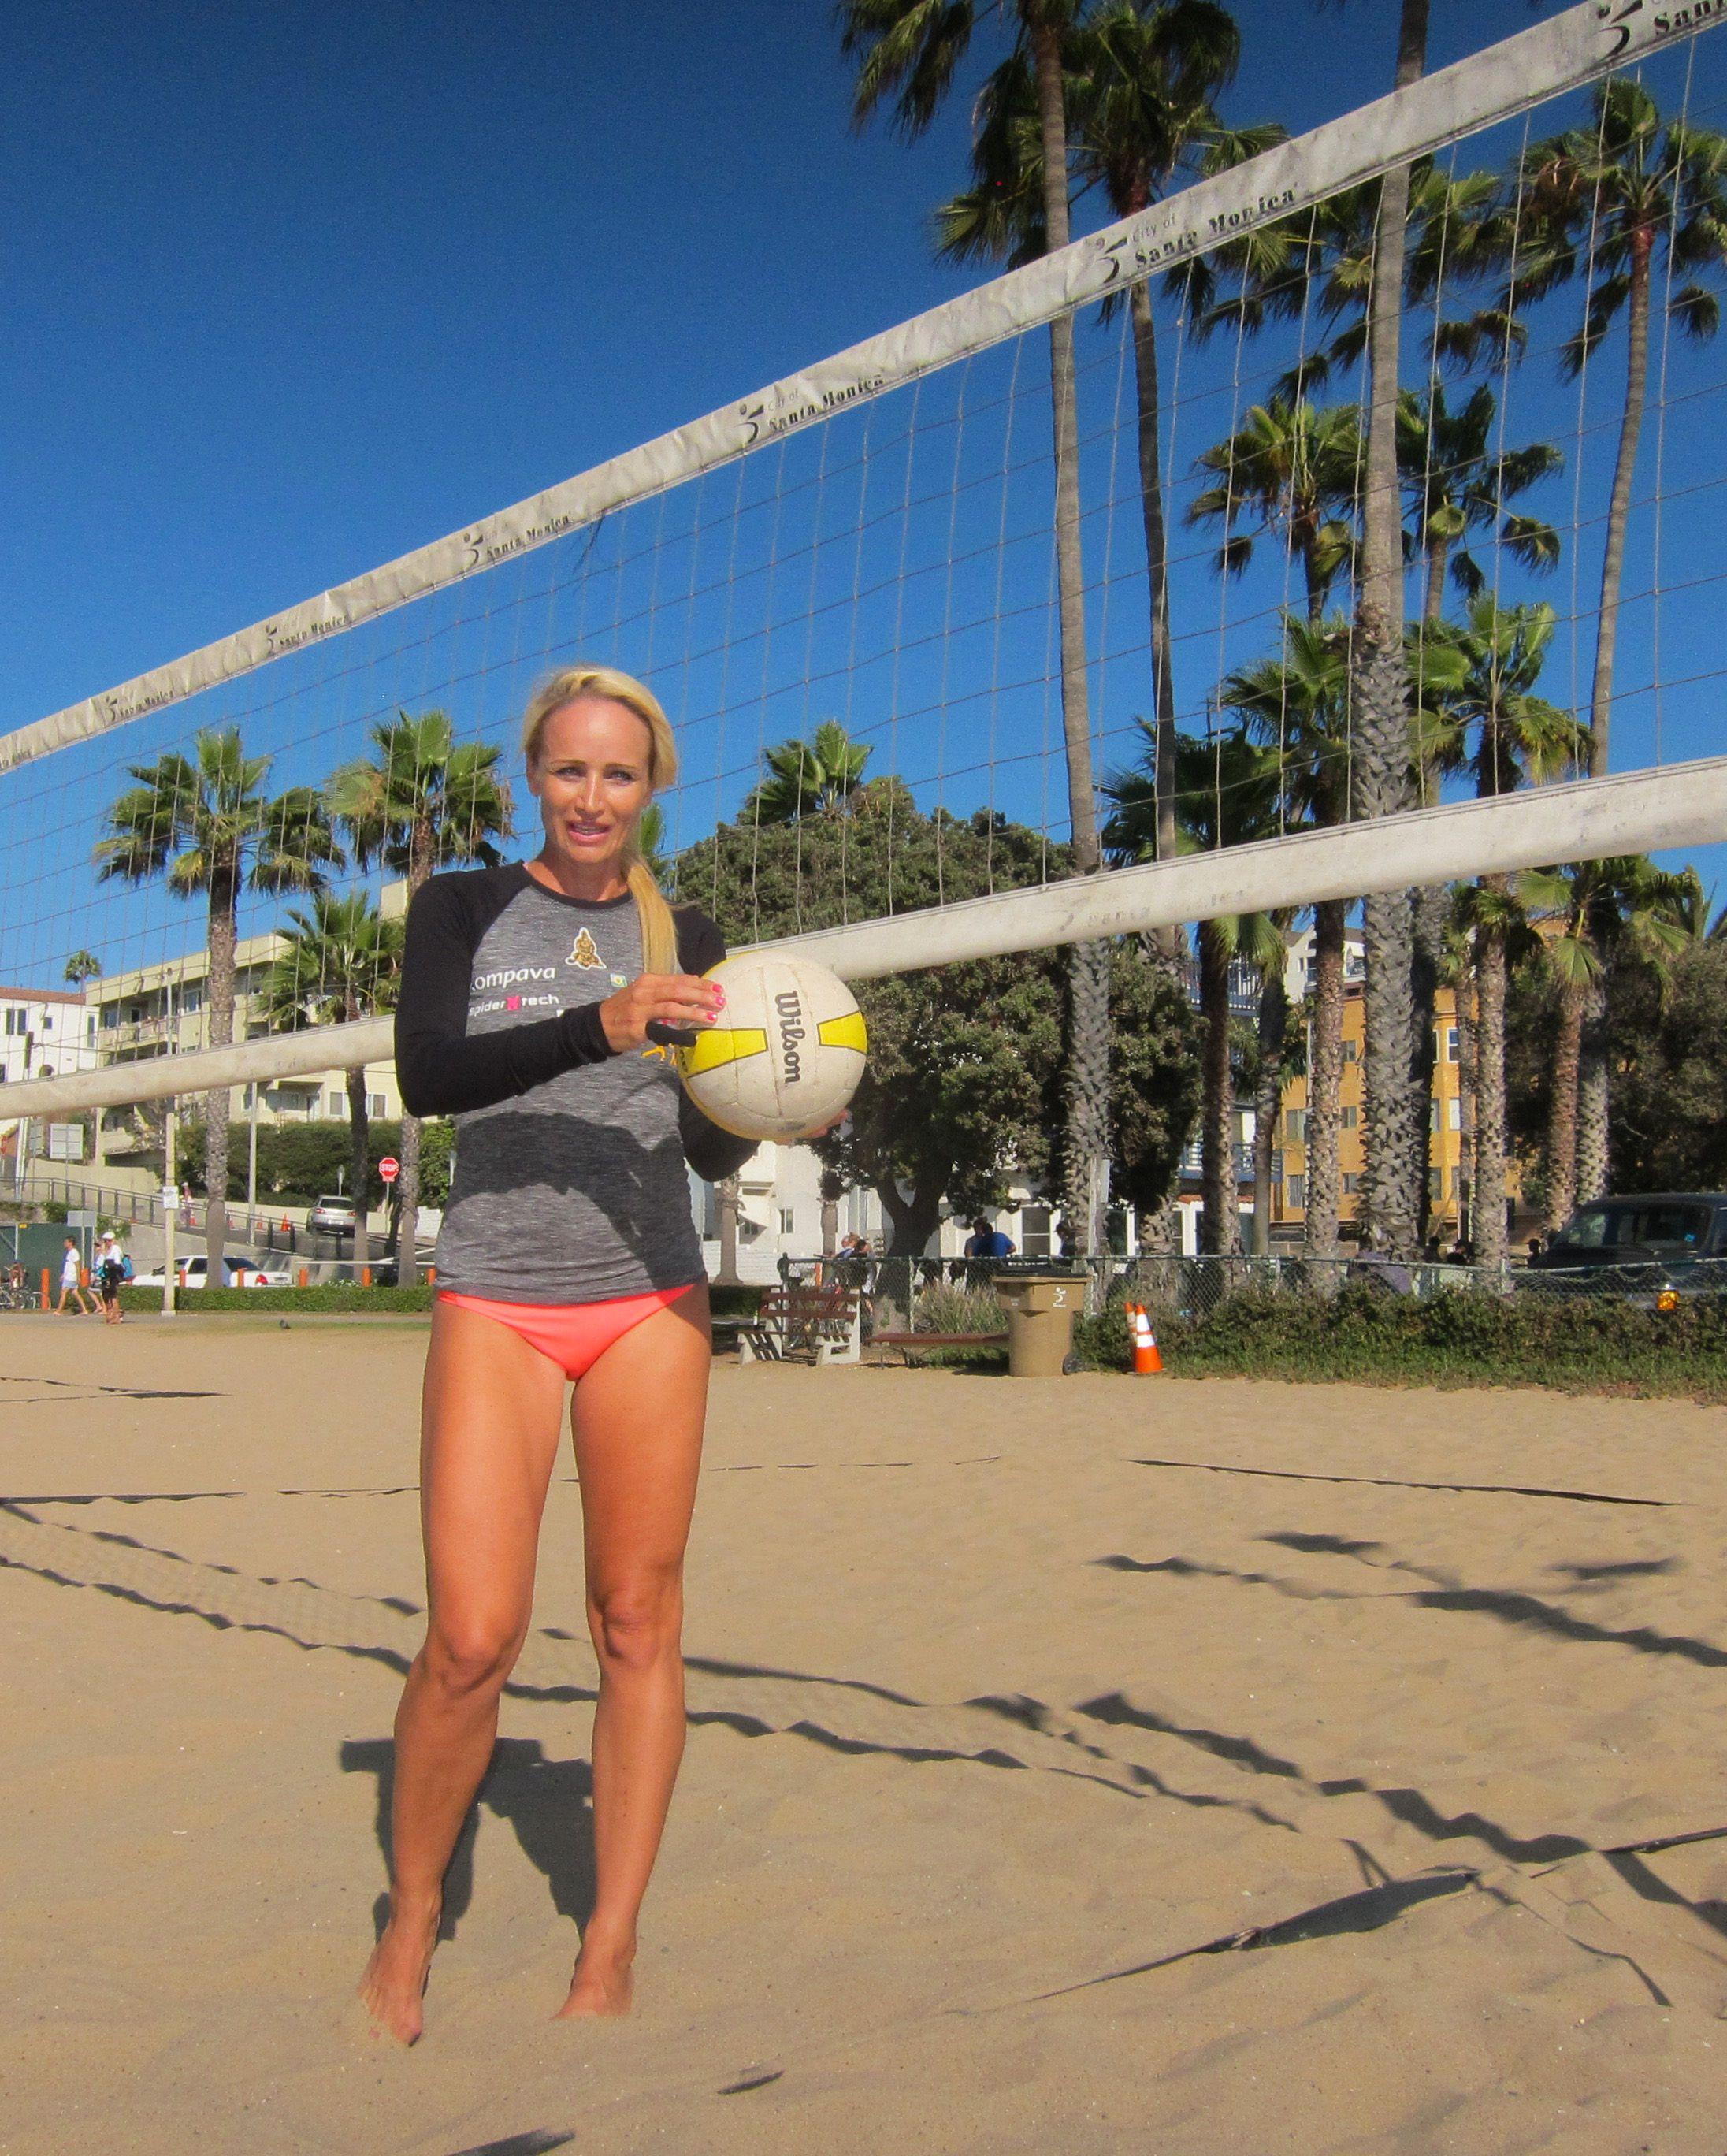 Waiting For My Teammates At The Santa Monica Beach Santamonica Beachvolleyball Musclebeach Play Win Sunny Be Muscle Beach Monica Beach Beach Volleyball